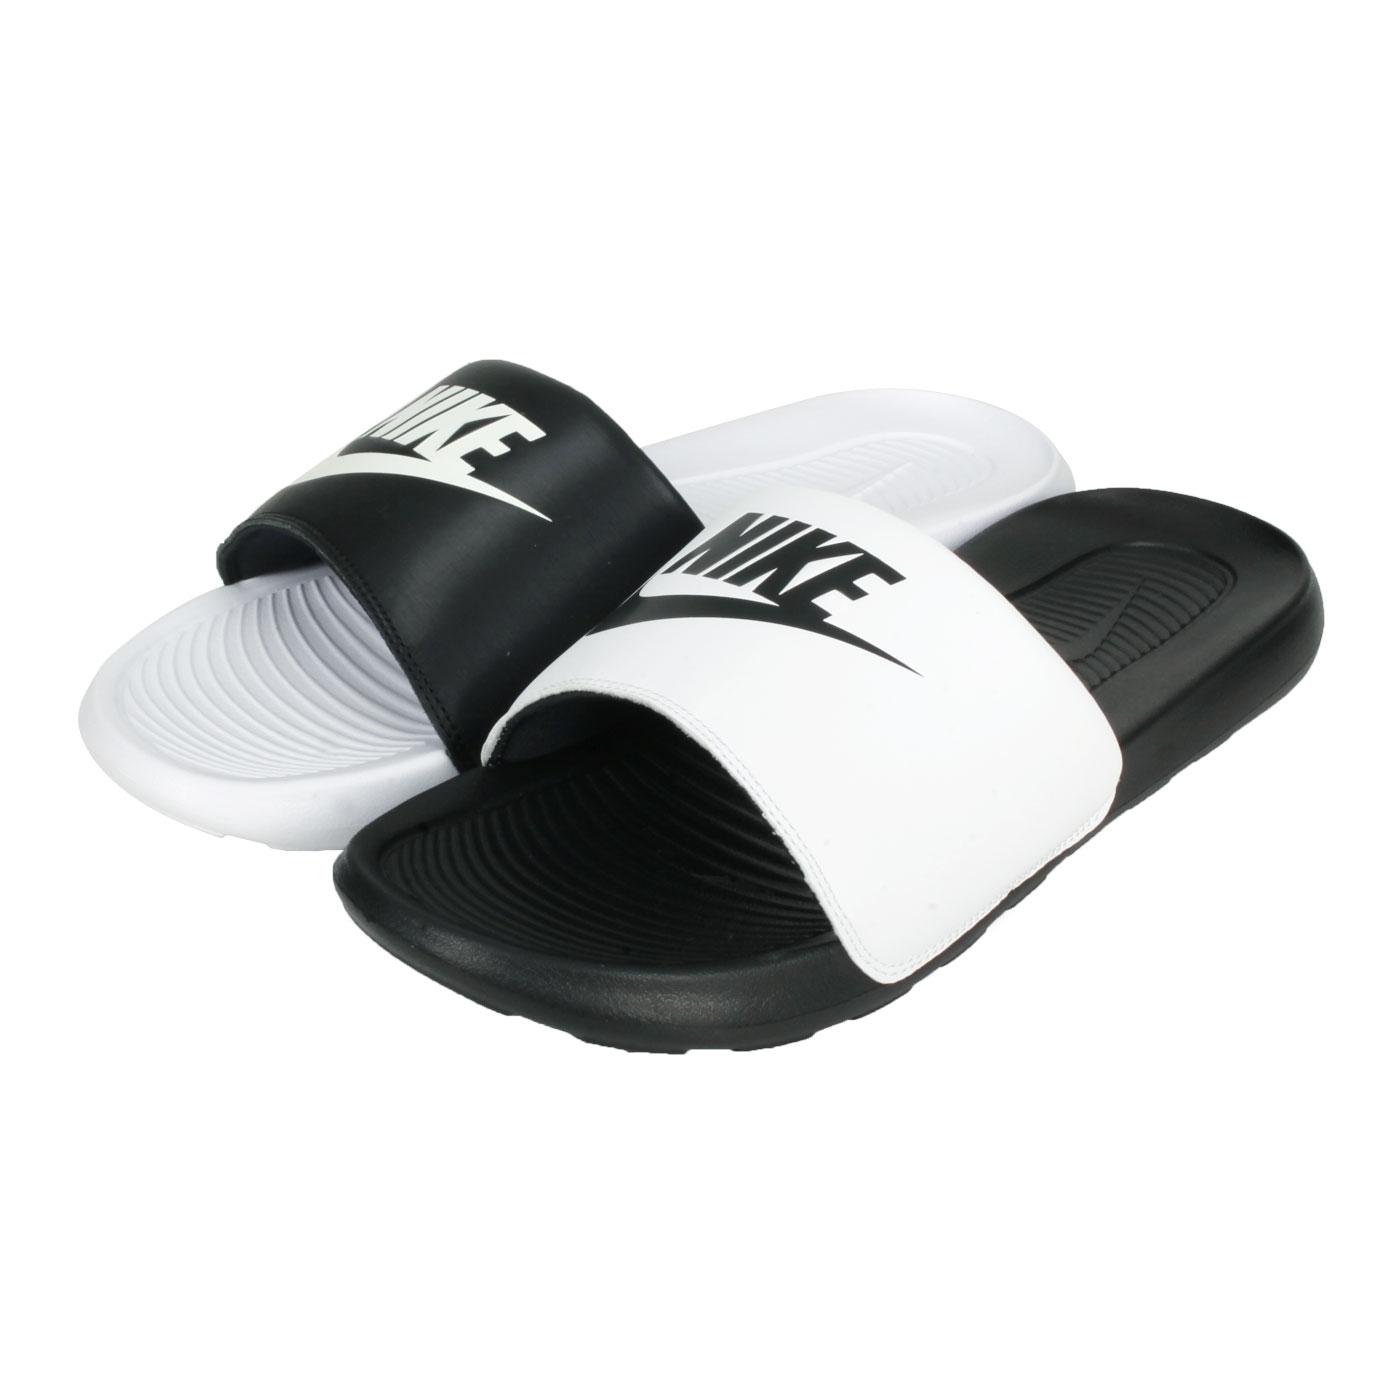 NIKE 女款休閒拖鞋  @W VICTORI ONE SLIDE MIX@DD0228-100 - 黑白